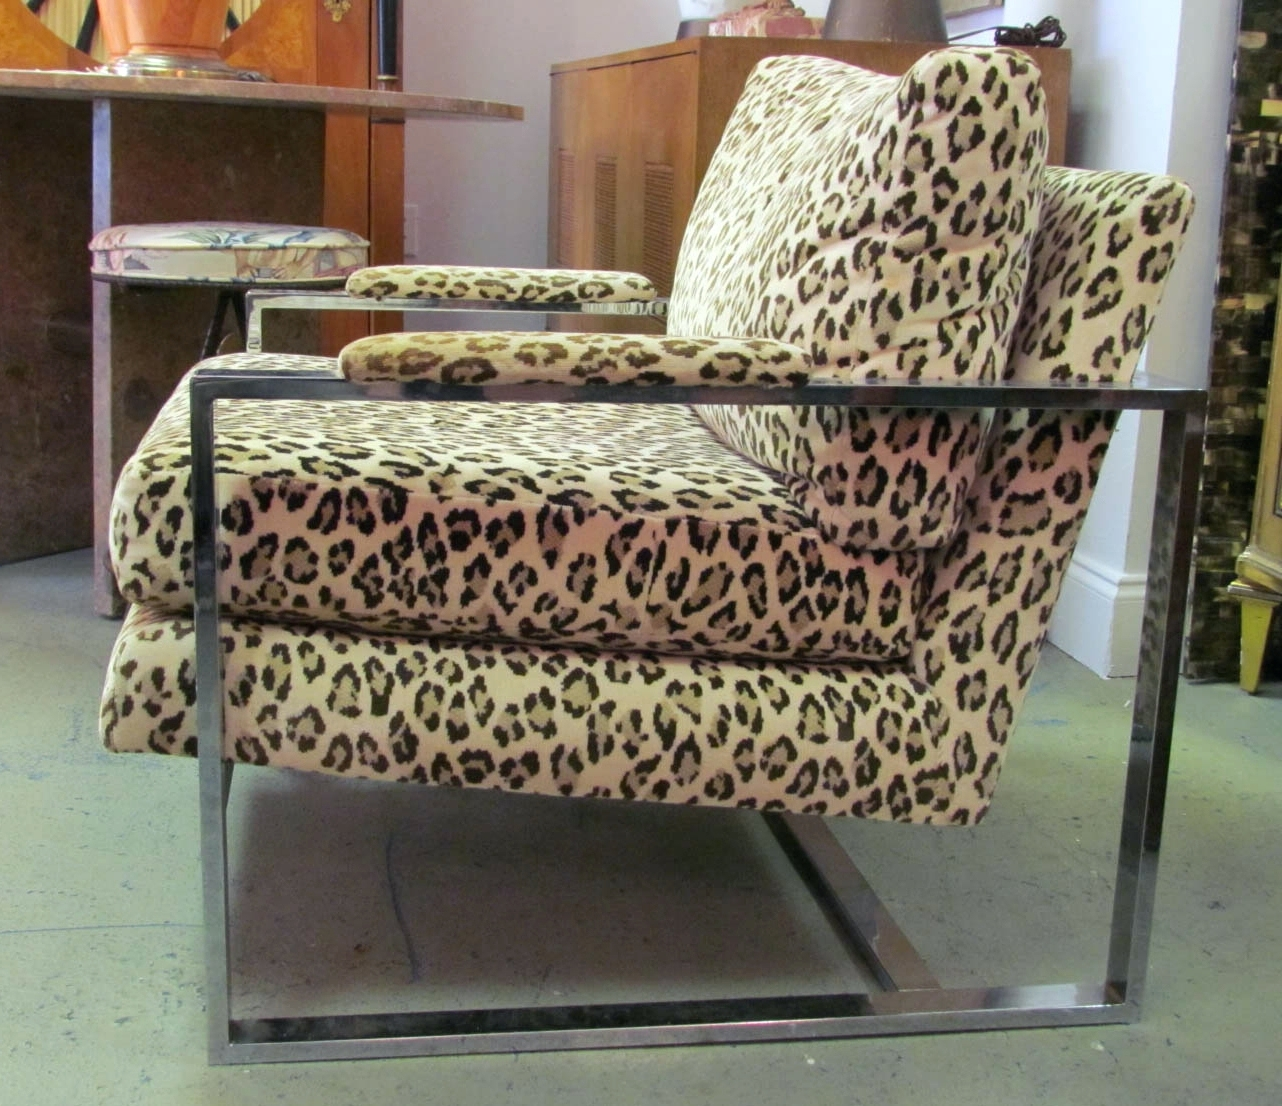 Zebra Animal Print Chaise Lounge Chair • Lounge Chairs Ideas With Well Known Zebra Print Chaise Lounge Chairs (View 14 of 15)